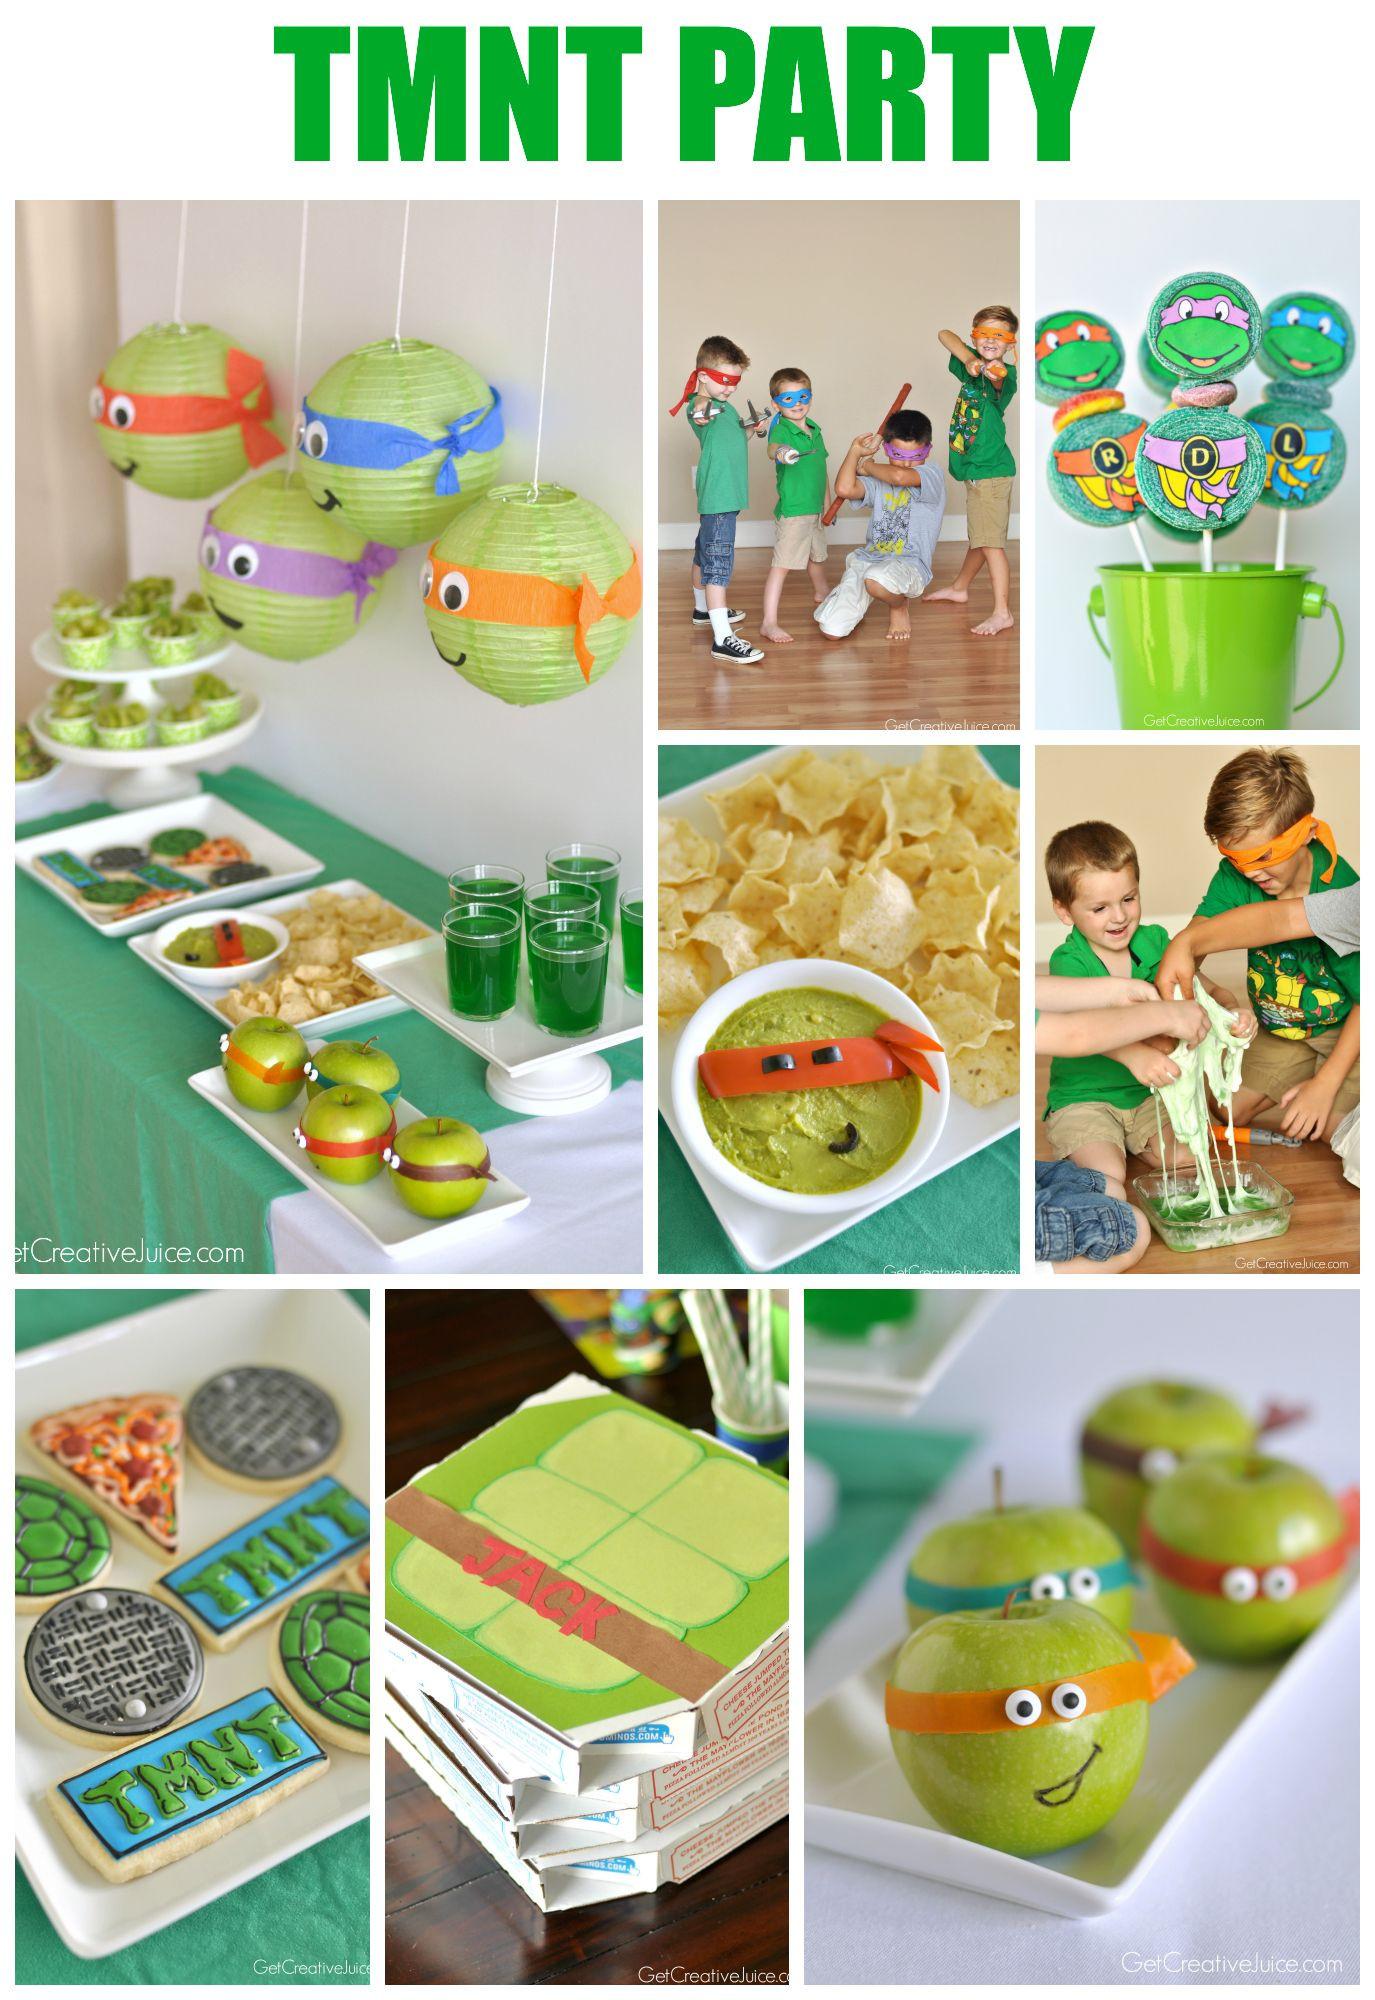 Ninja Turtle Birthday Party Food Ideas  TMNT Party Ideas